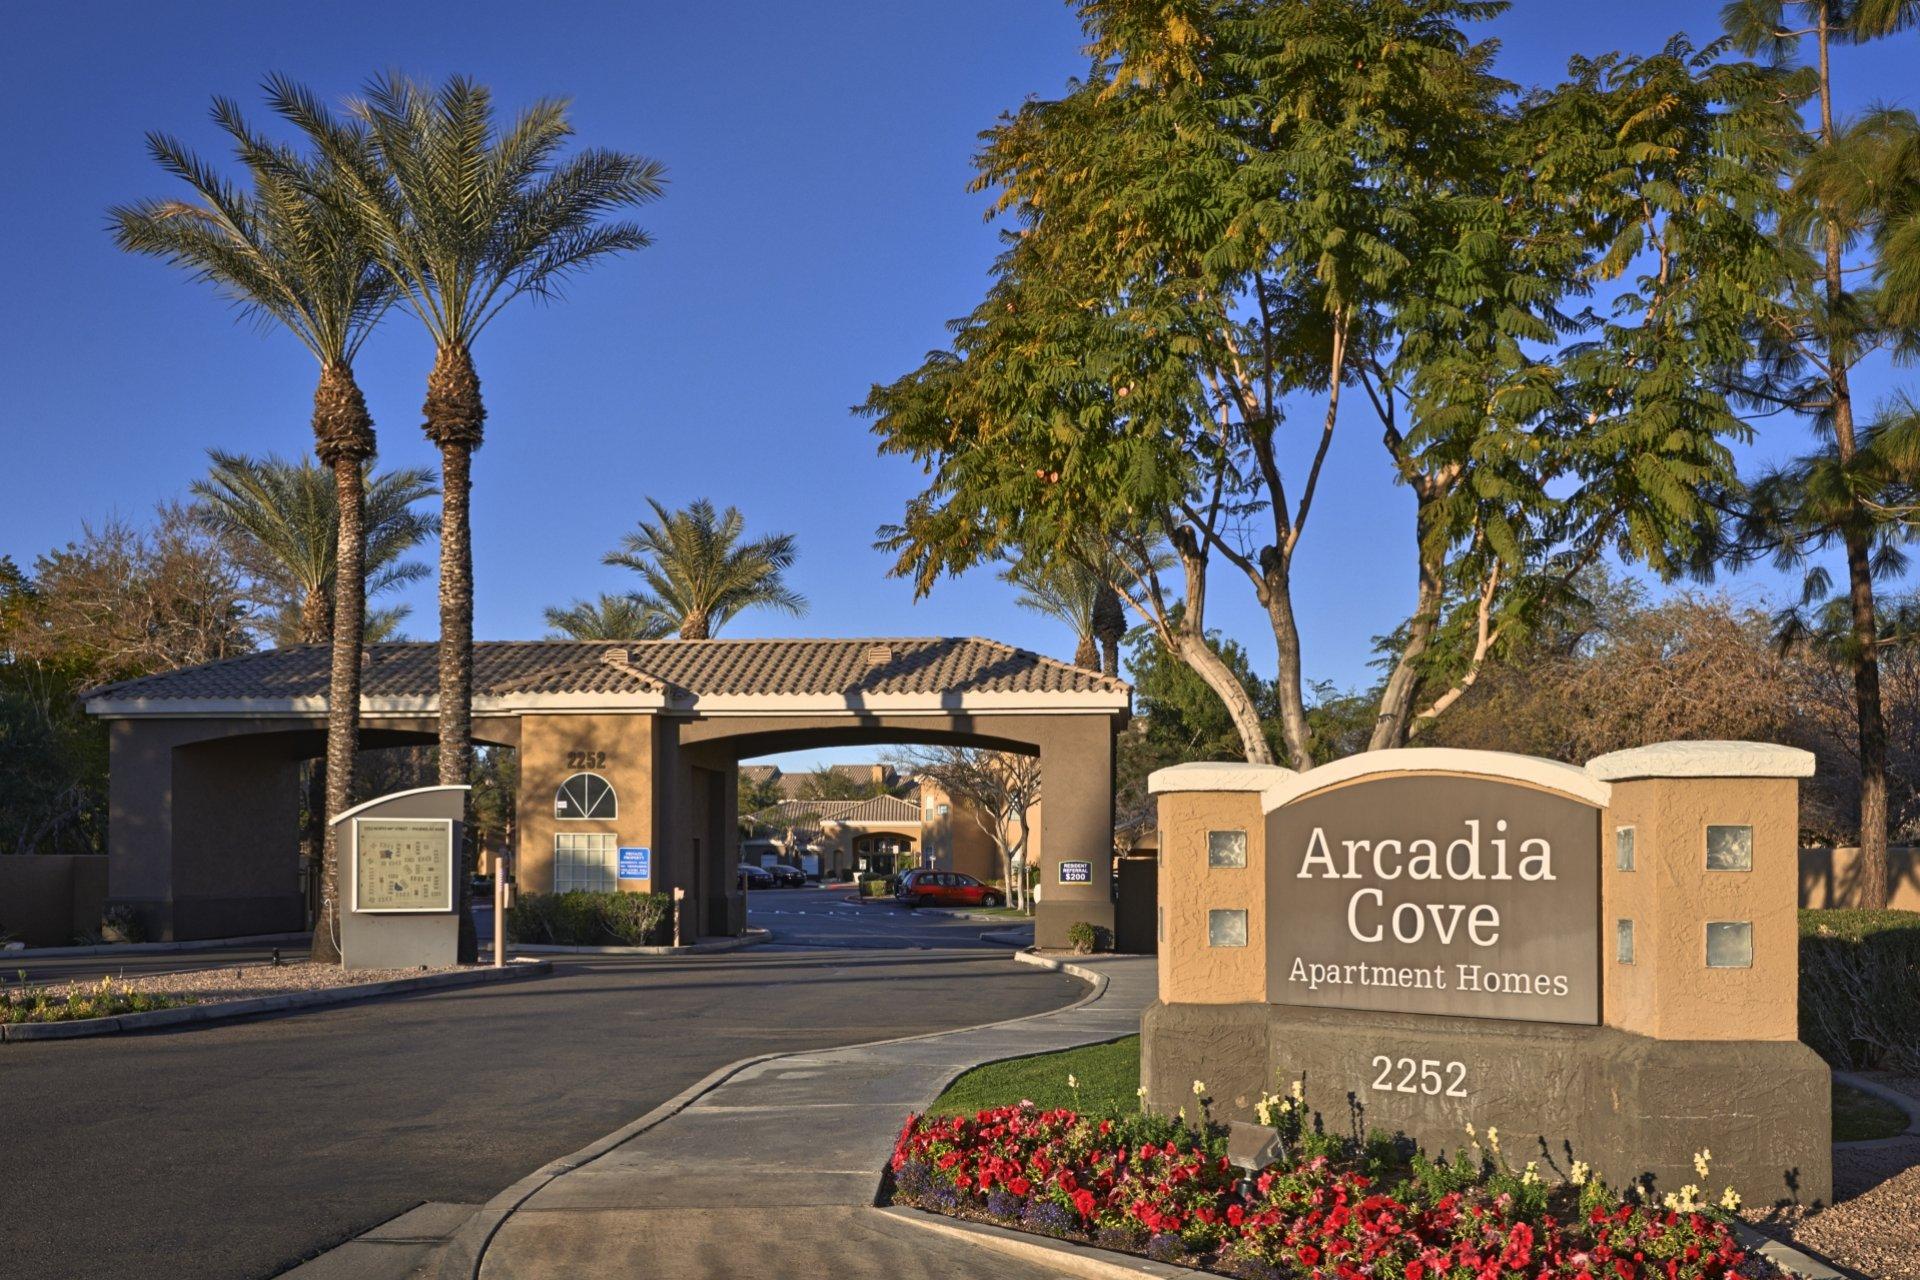 Arcadia Cove